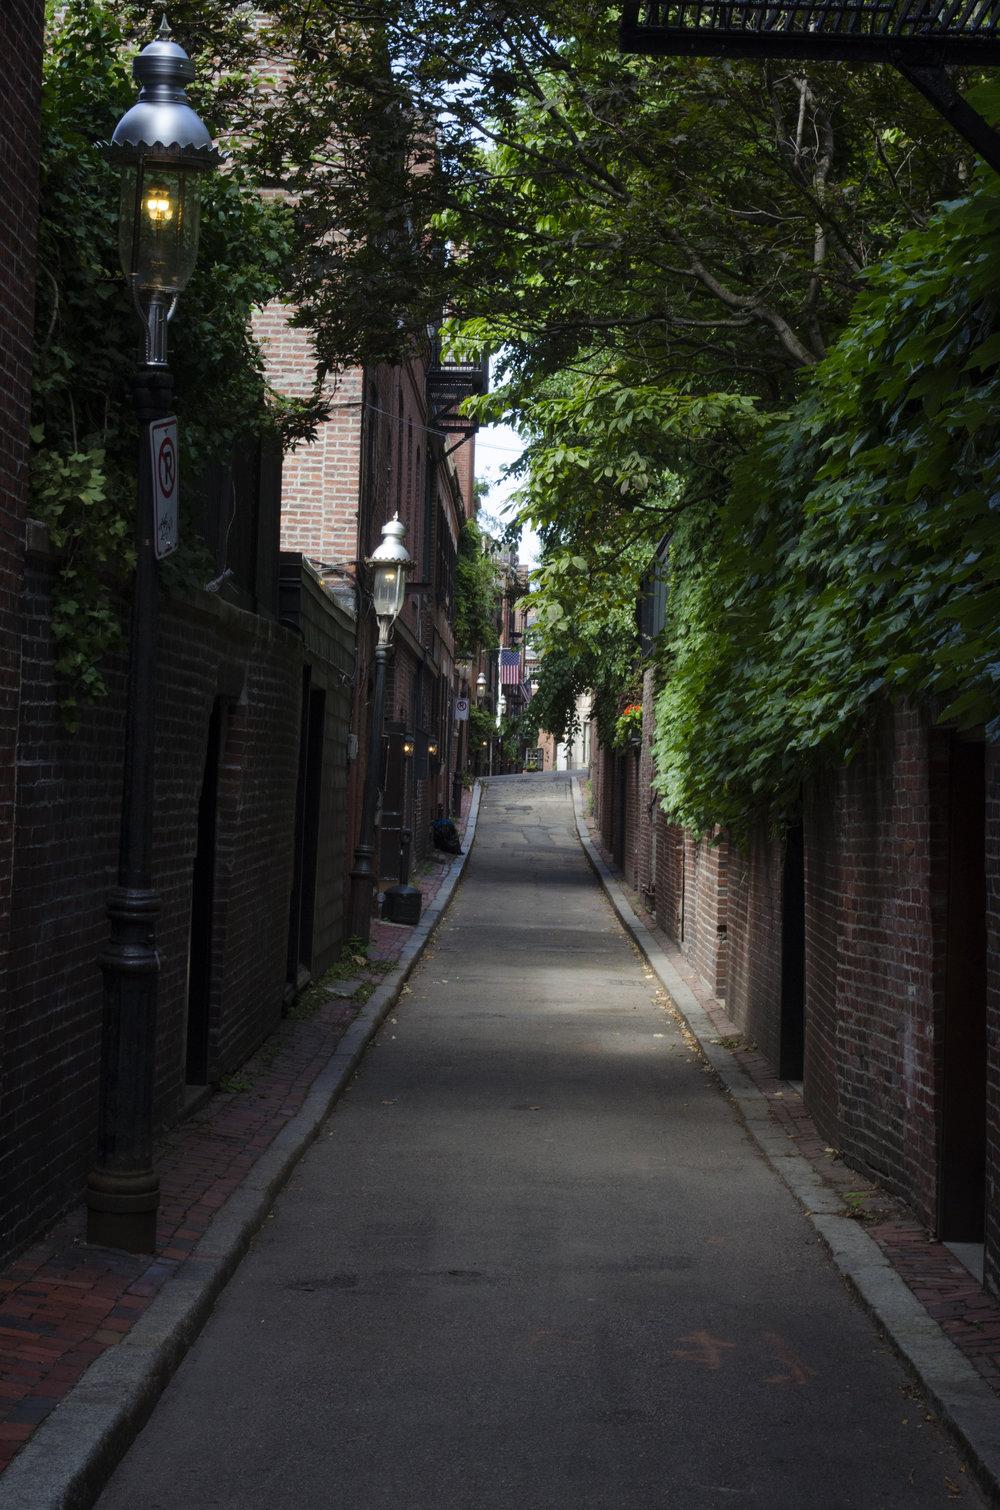 charlestown-alley_37056062805_o.jpg